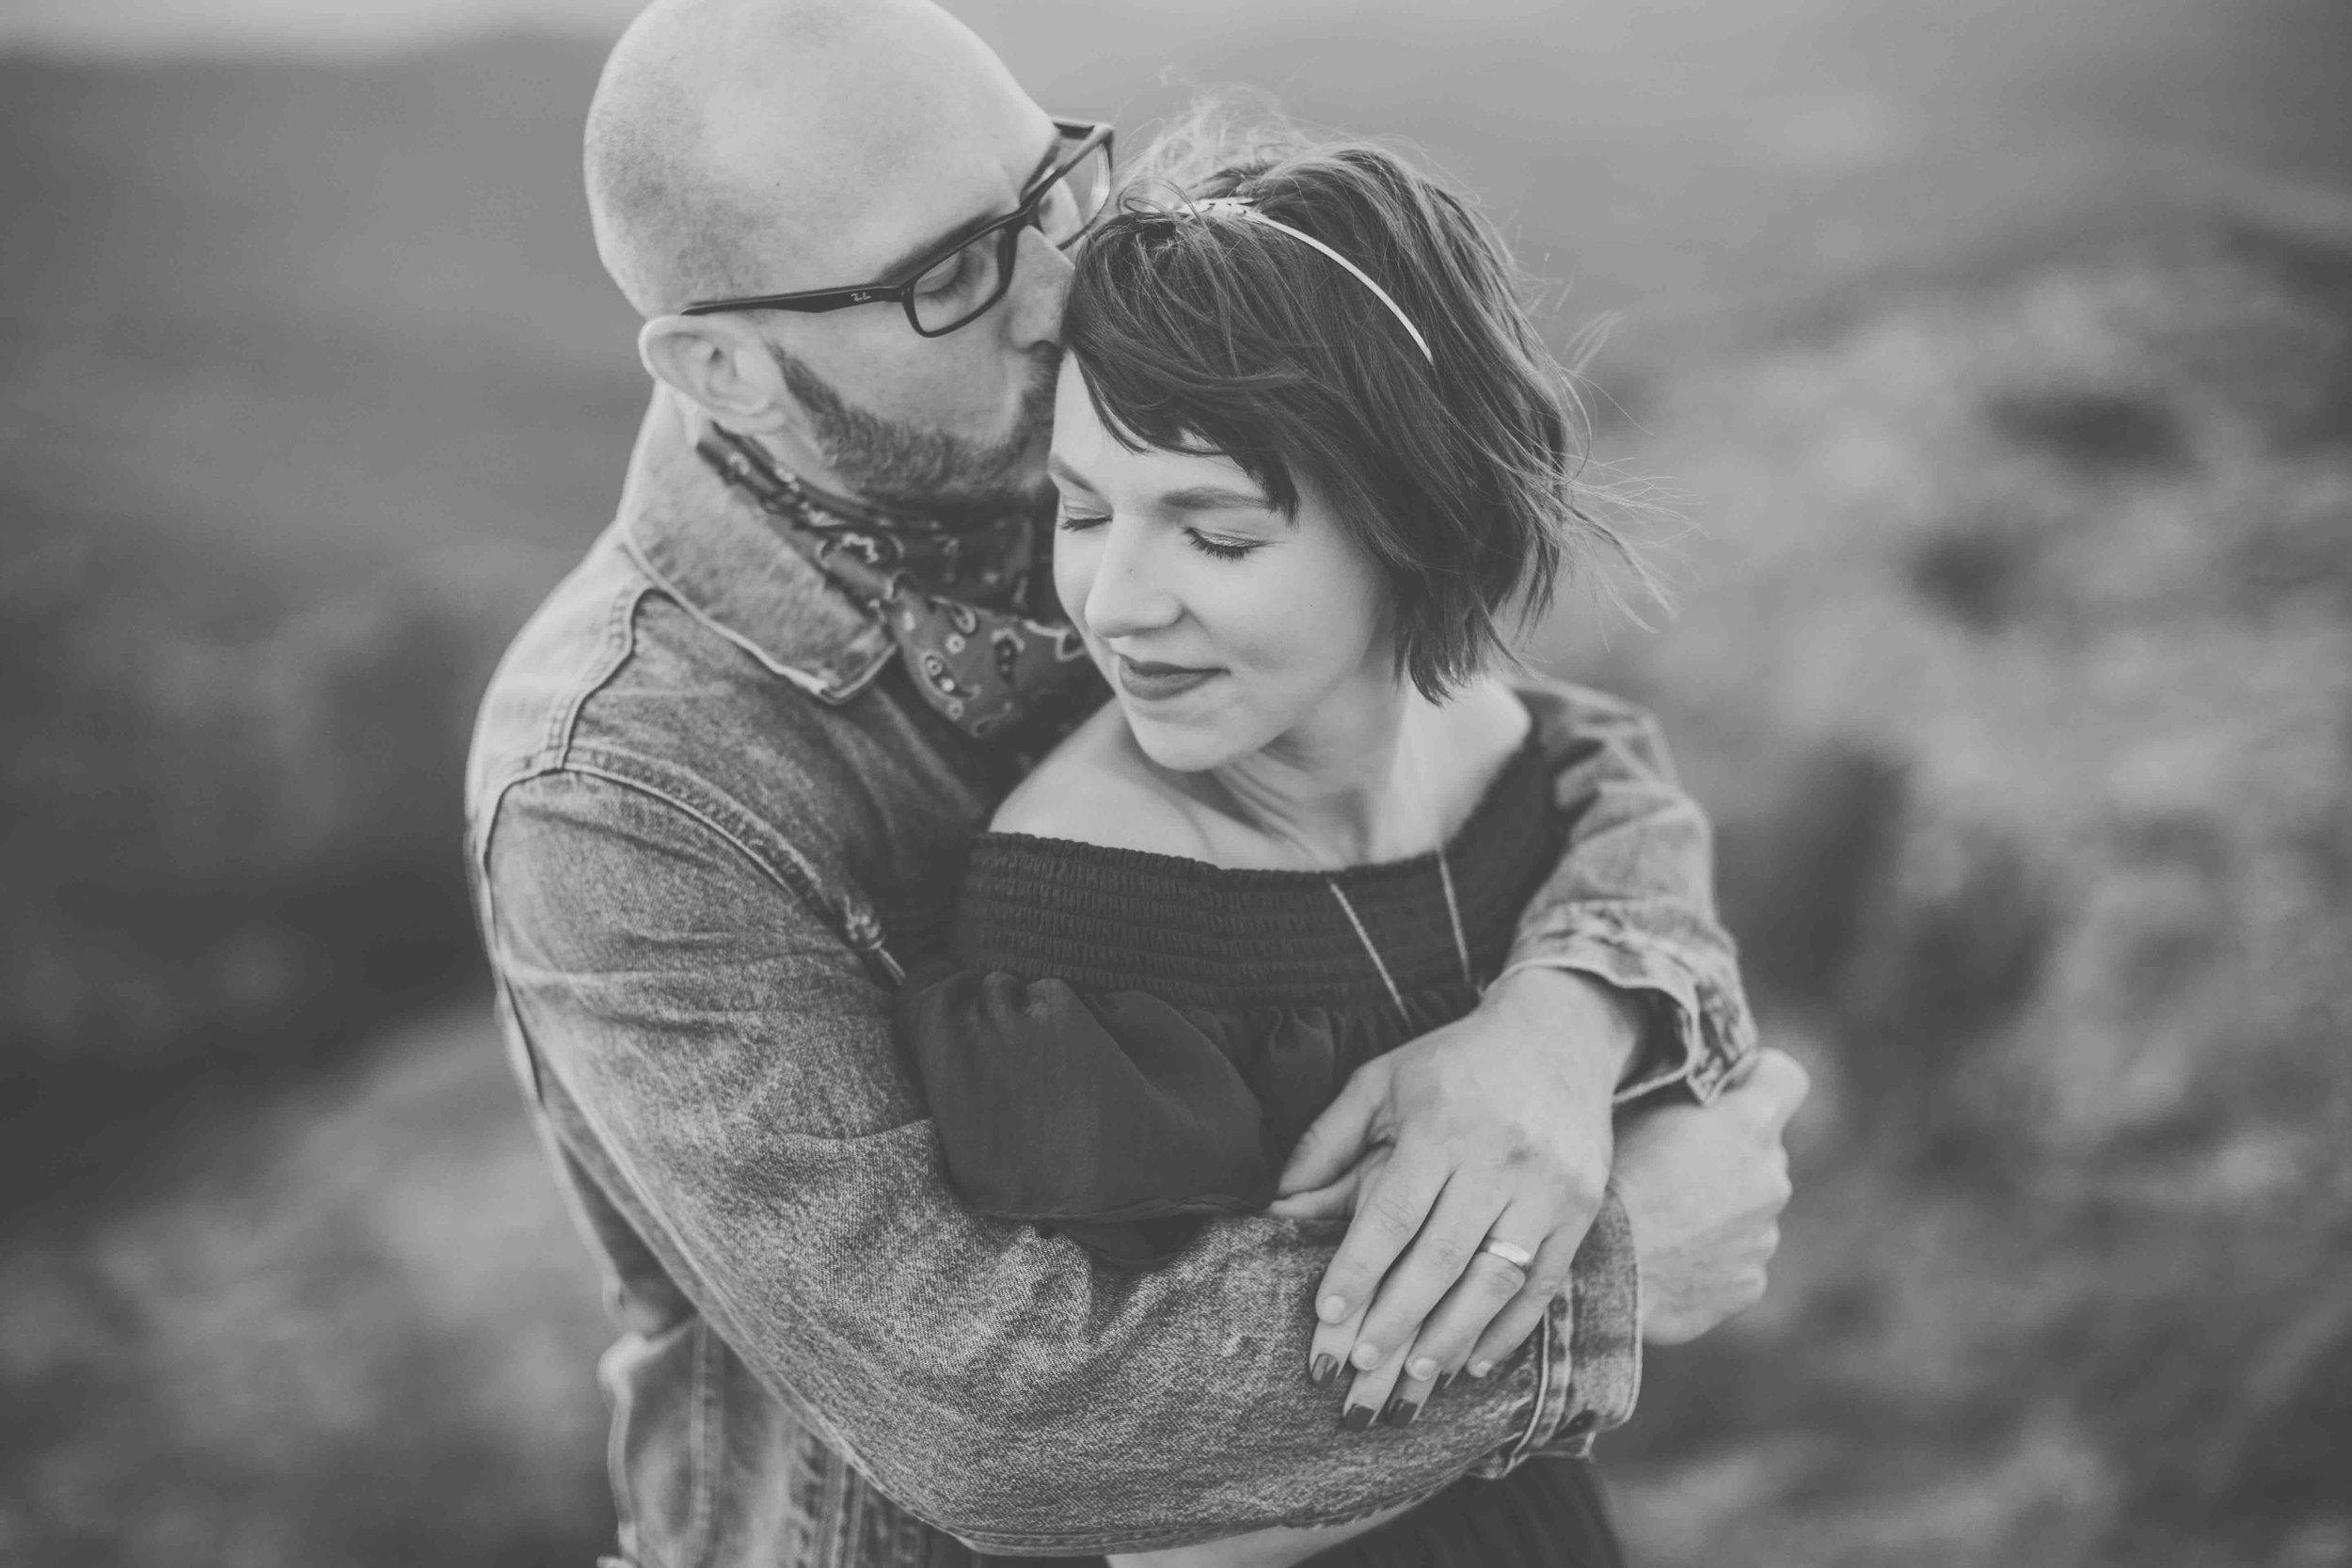 north-carolina-elopement-photographer-31.jpg